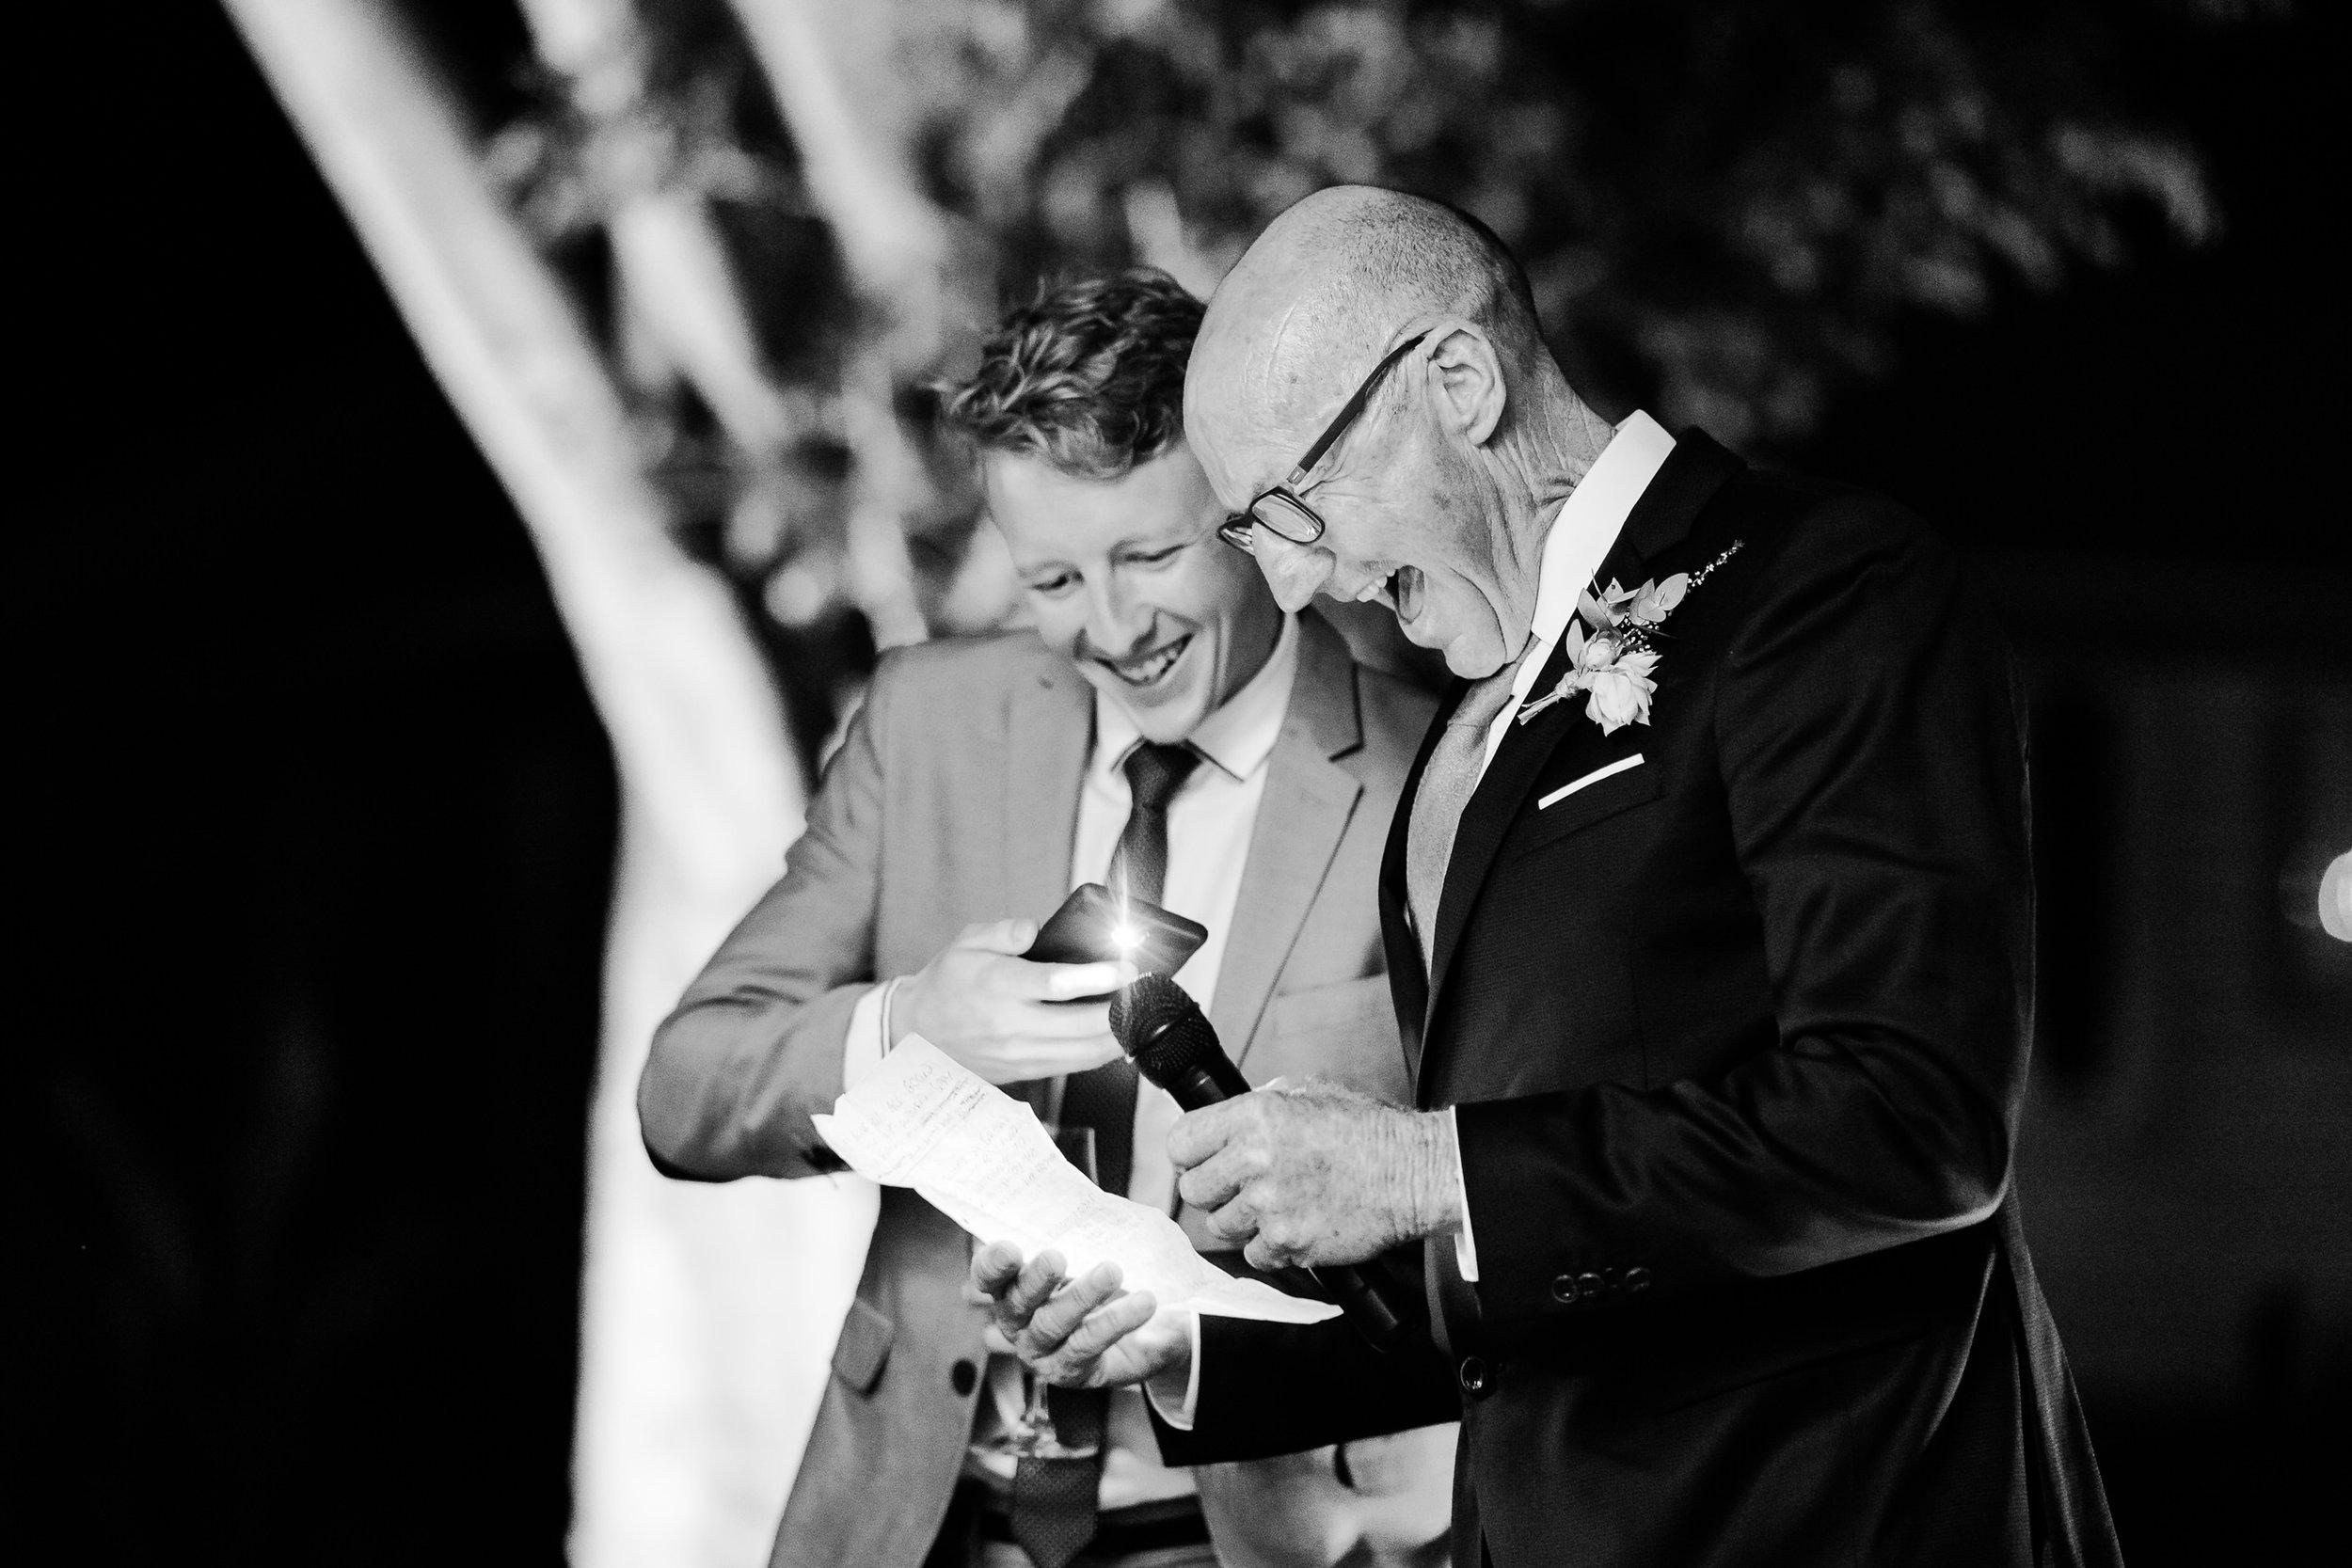 Justin_And_Jim_Photography_Byron_Bay_Wedding102.JPG